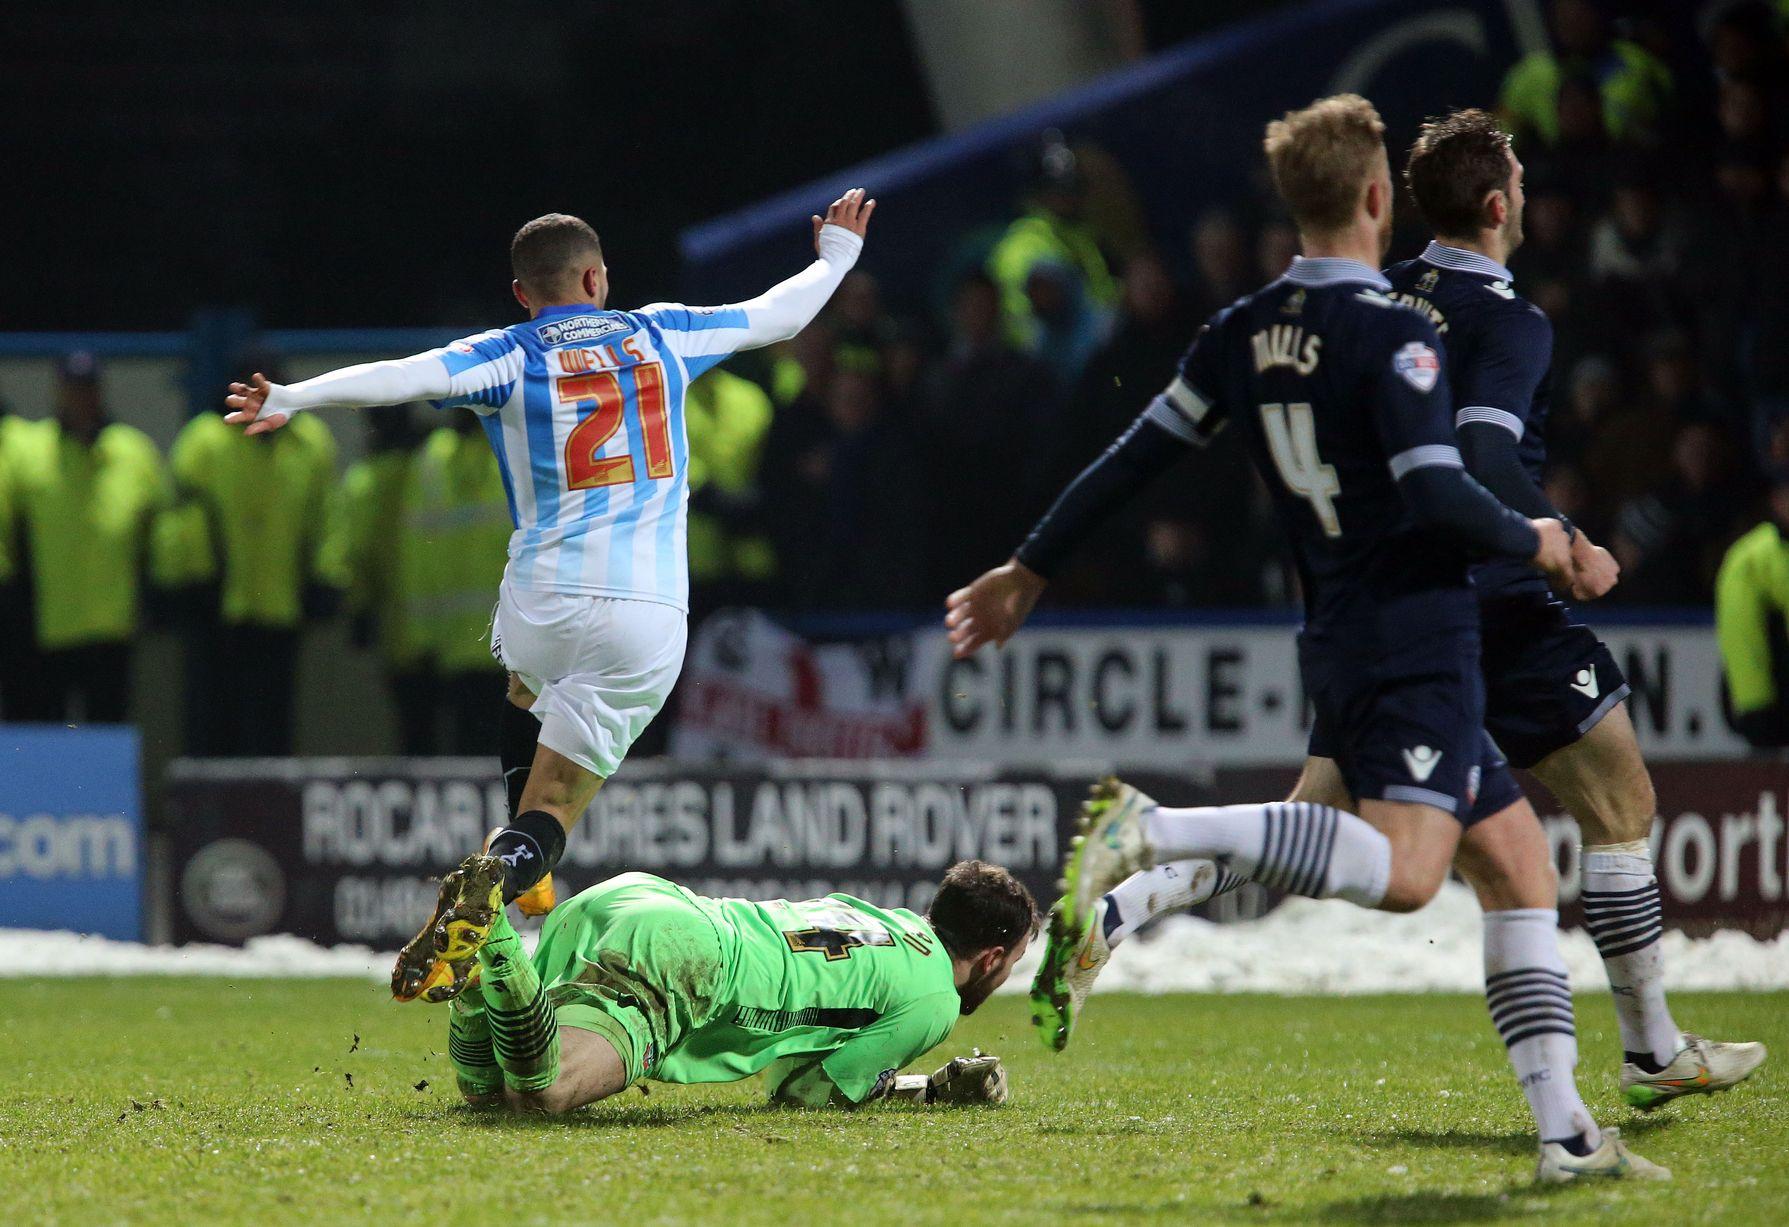 Huddersfield Town vs Bolton Wanderers